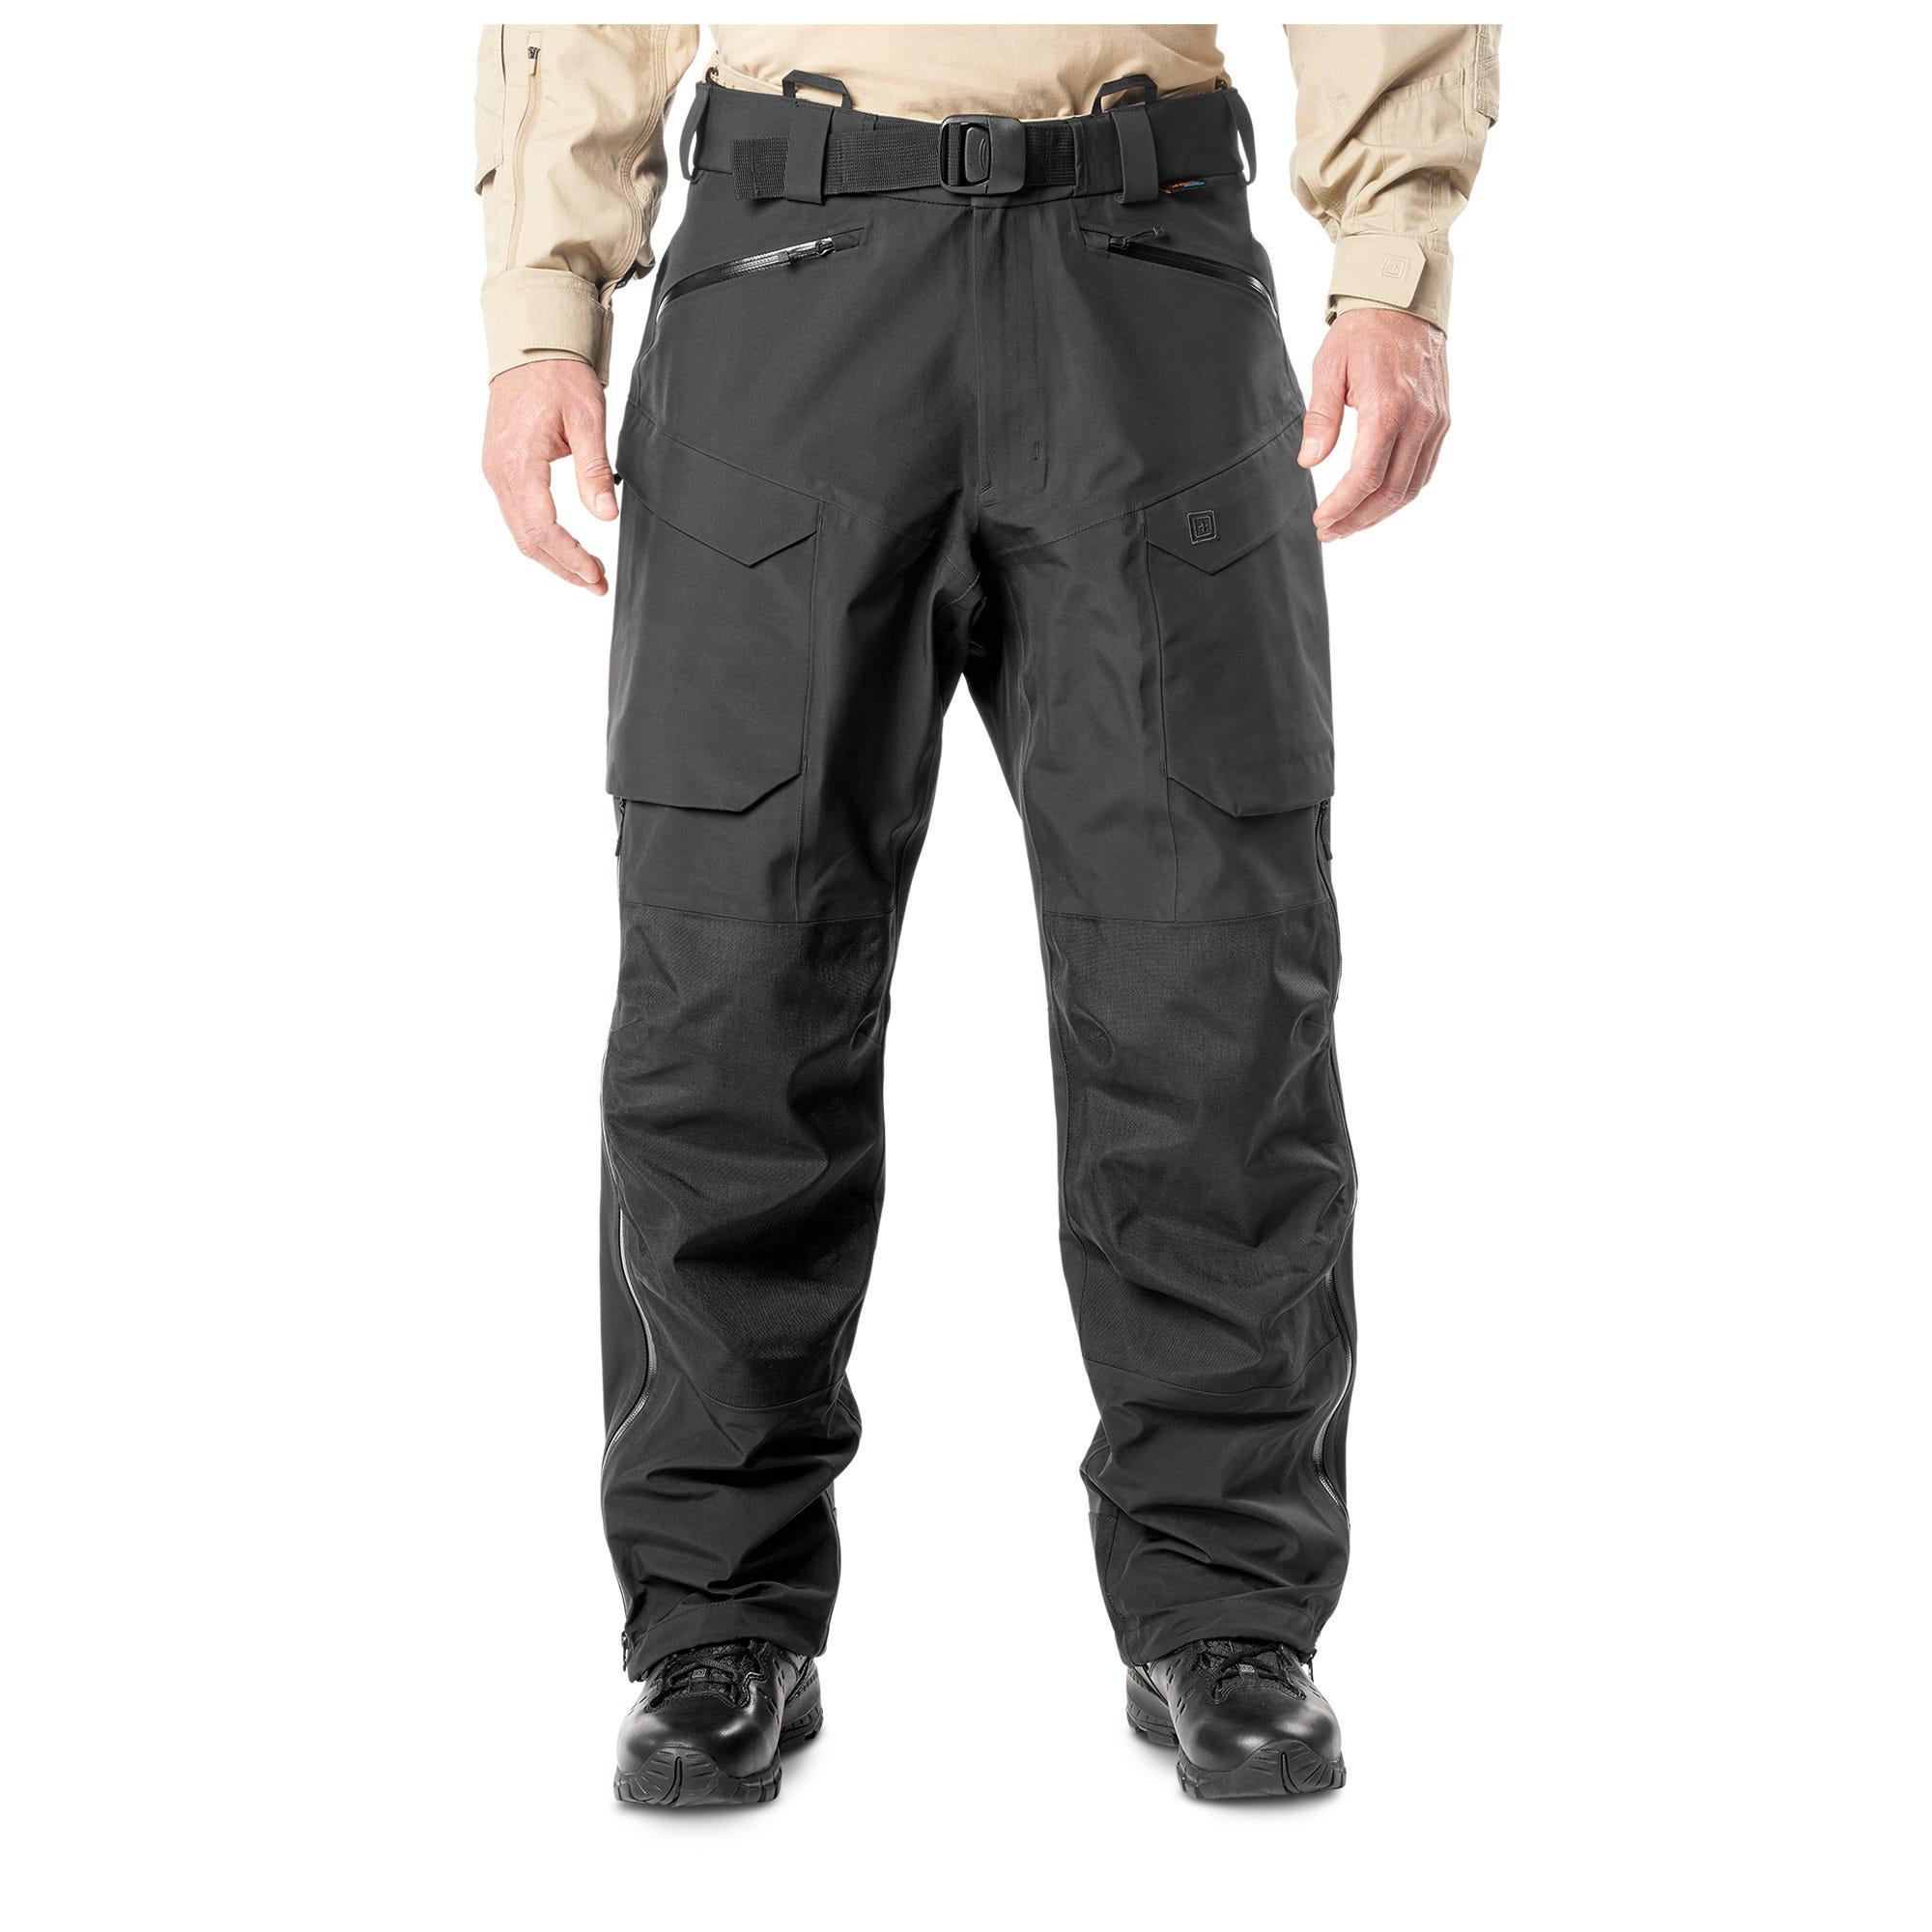 5.11 Tactical Men's XPRT Waterproof Pant (Black)